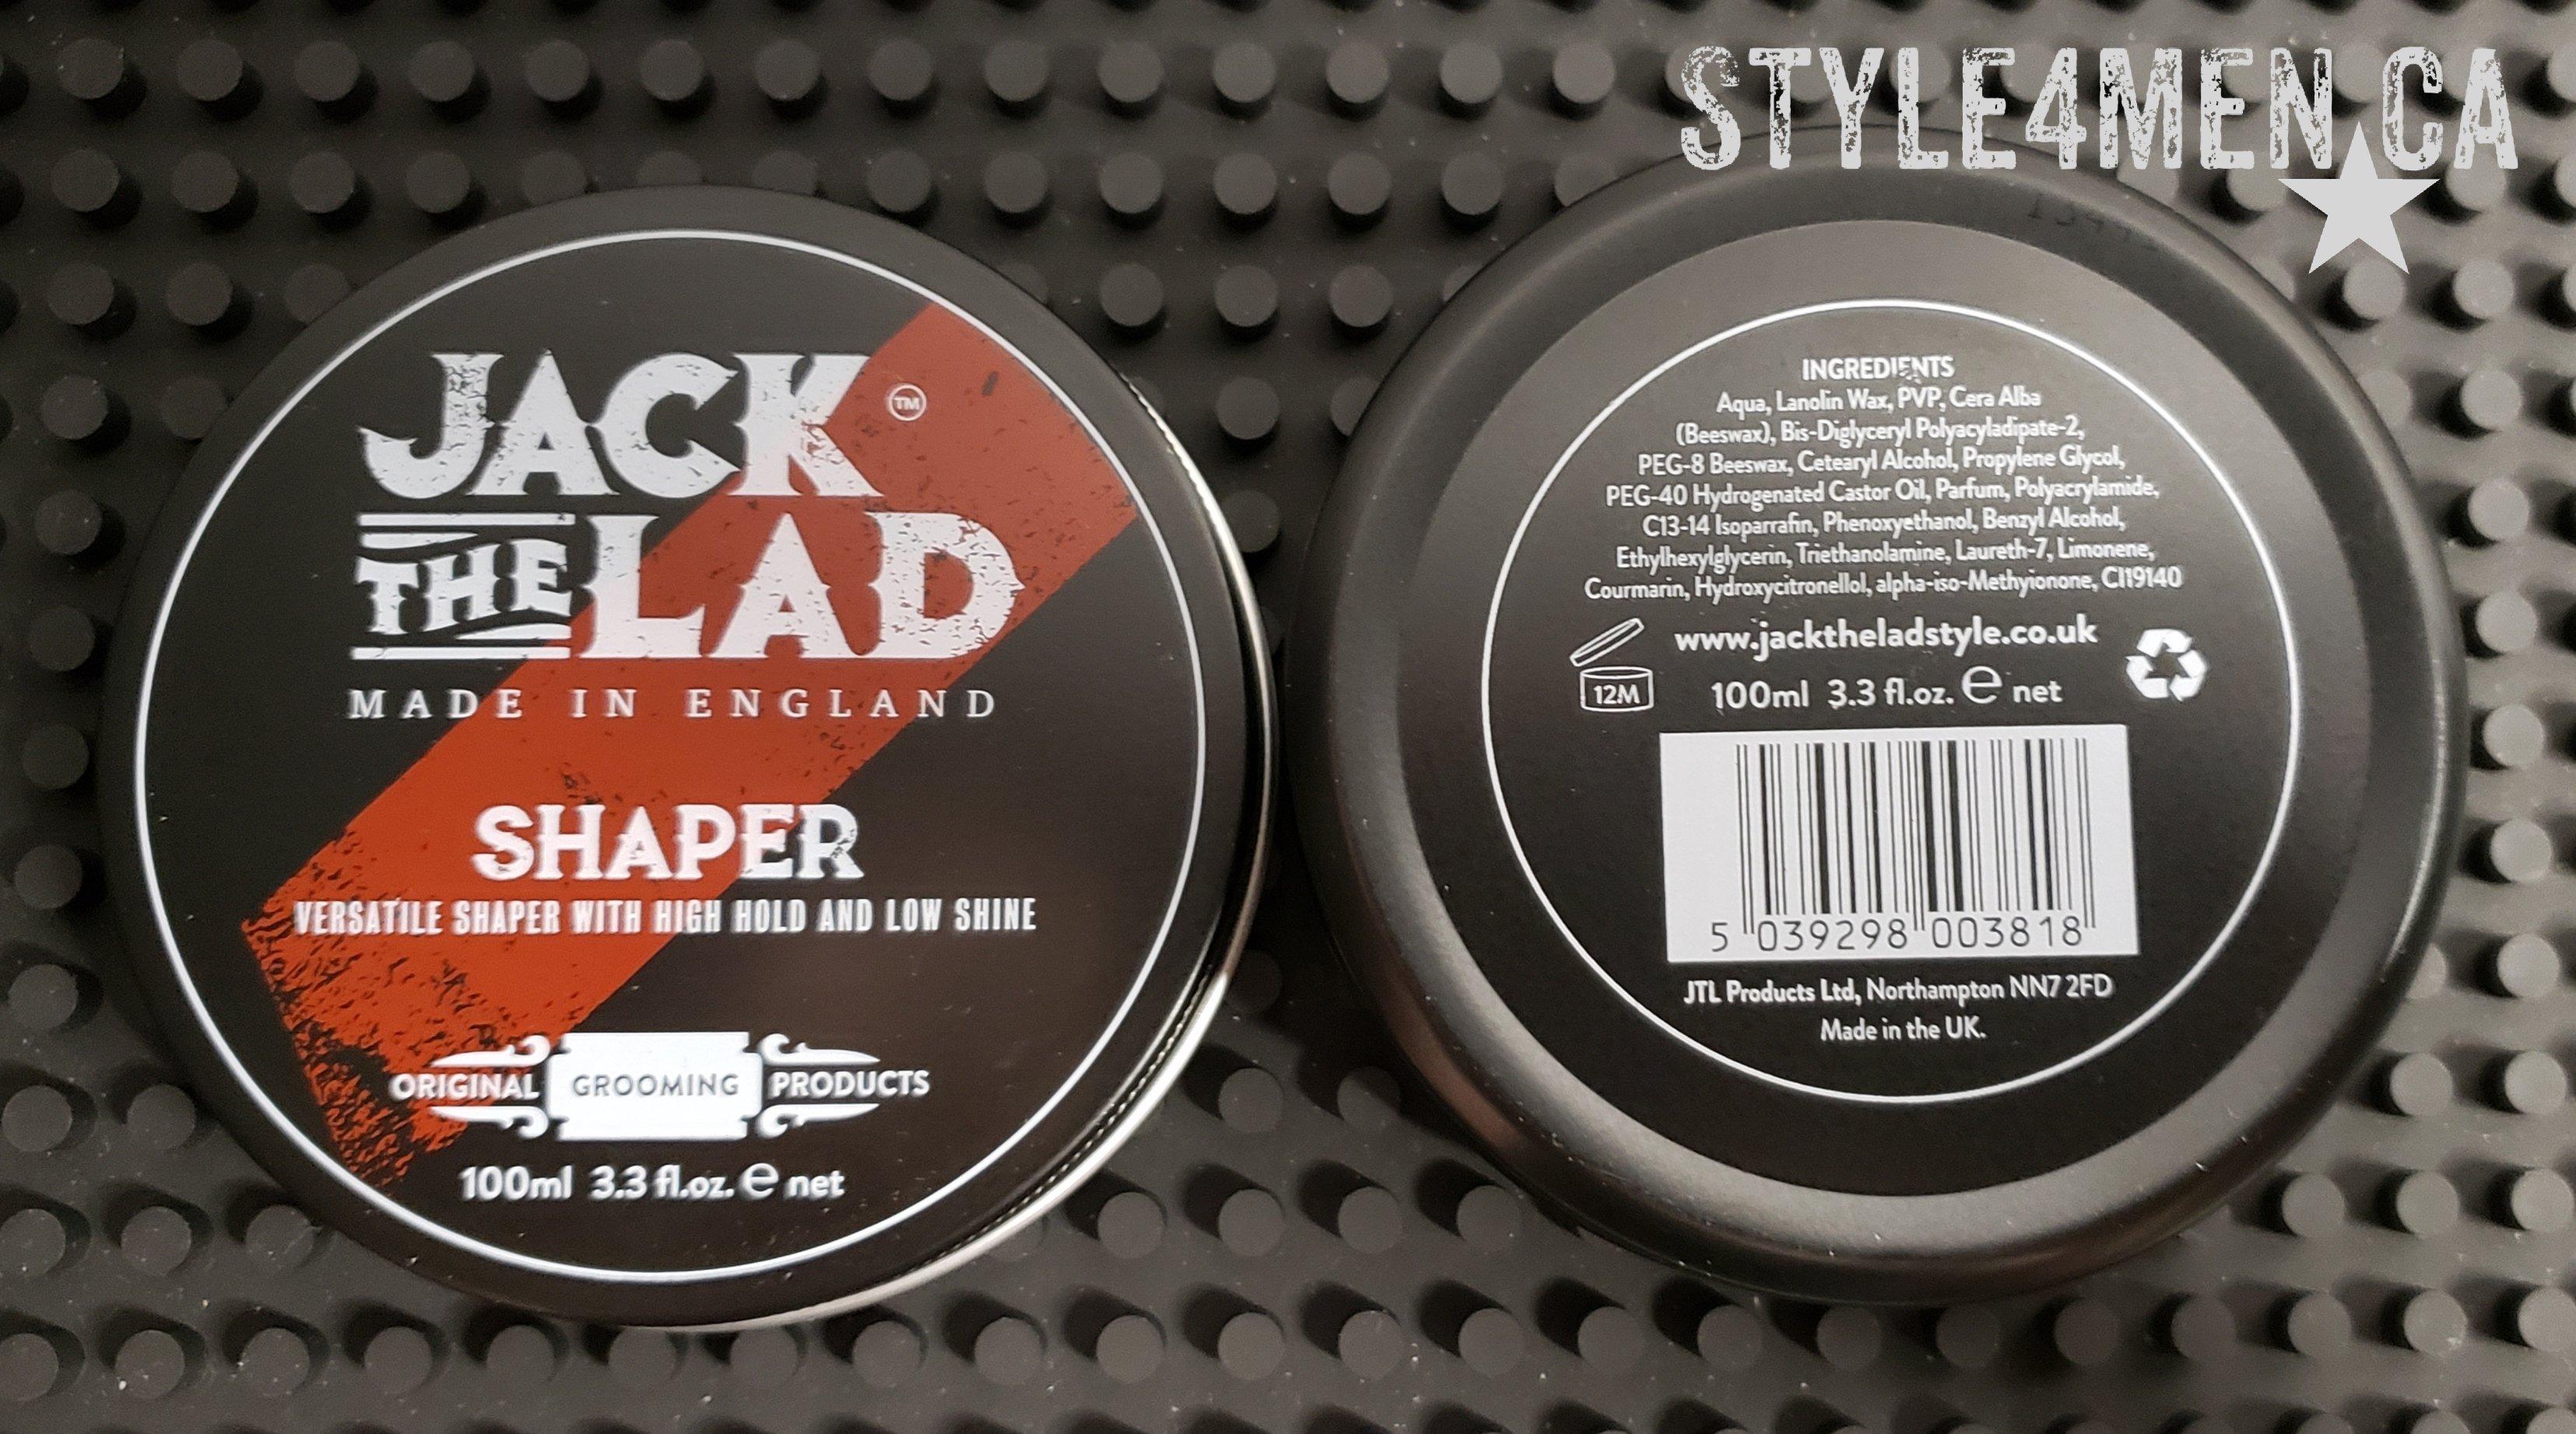 Jack The Lad Shaper